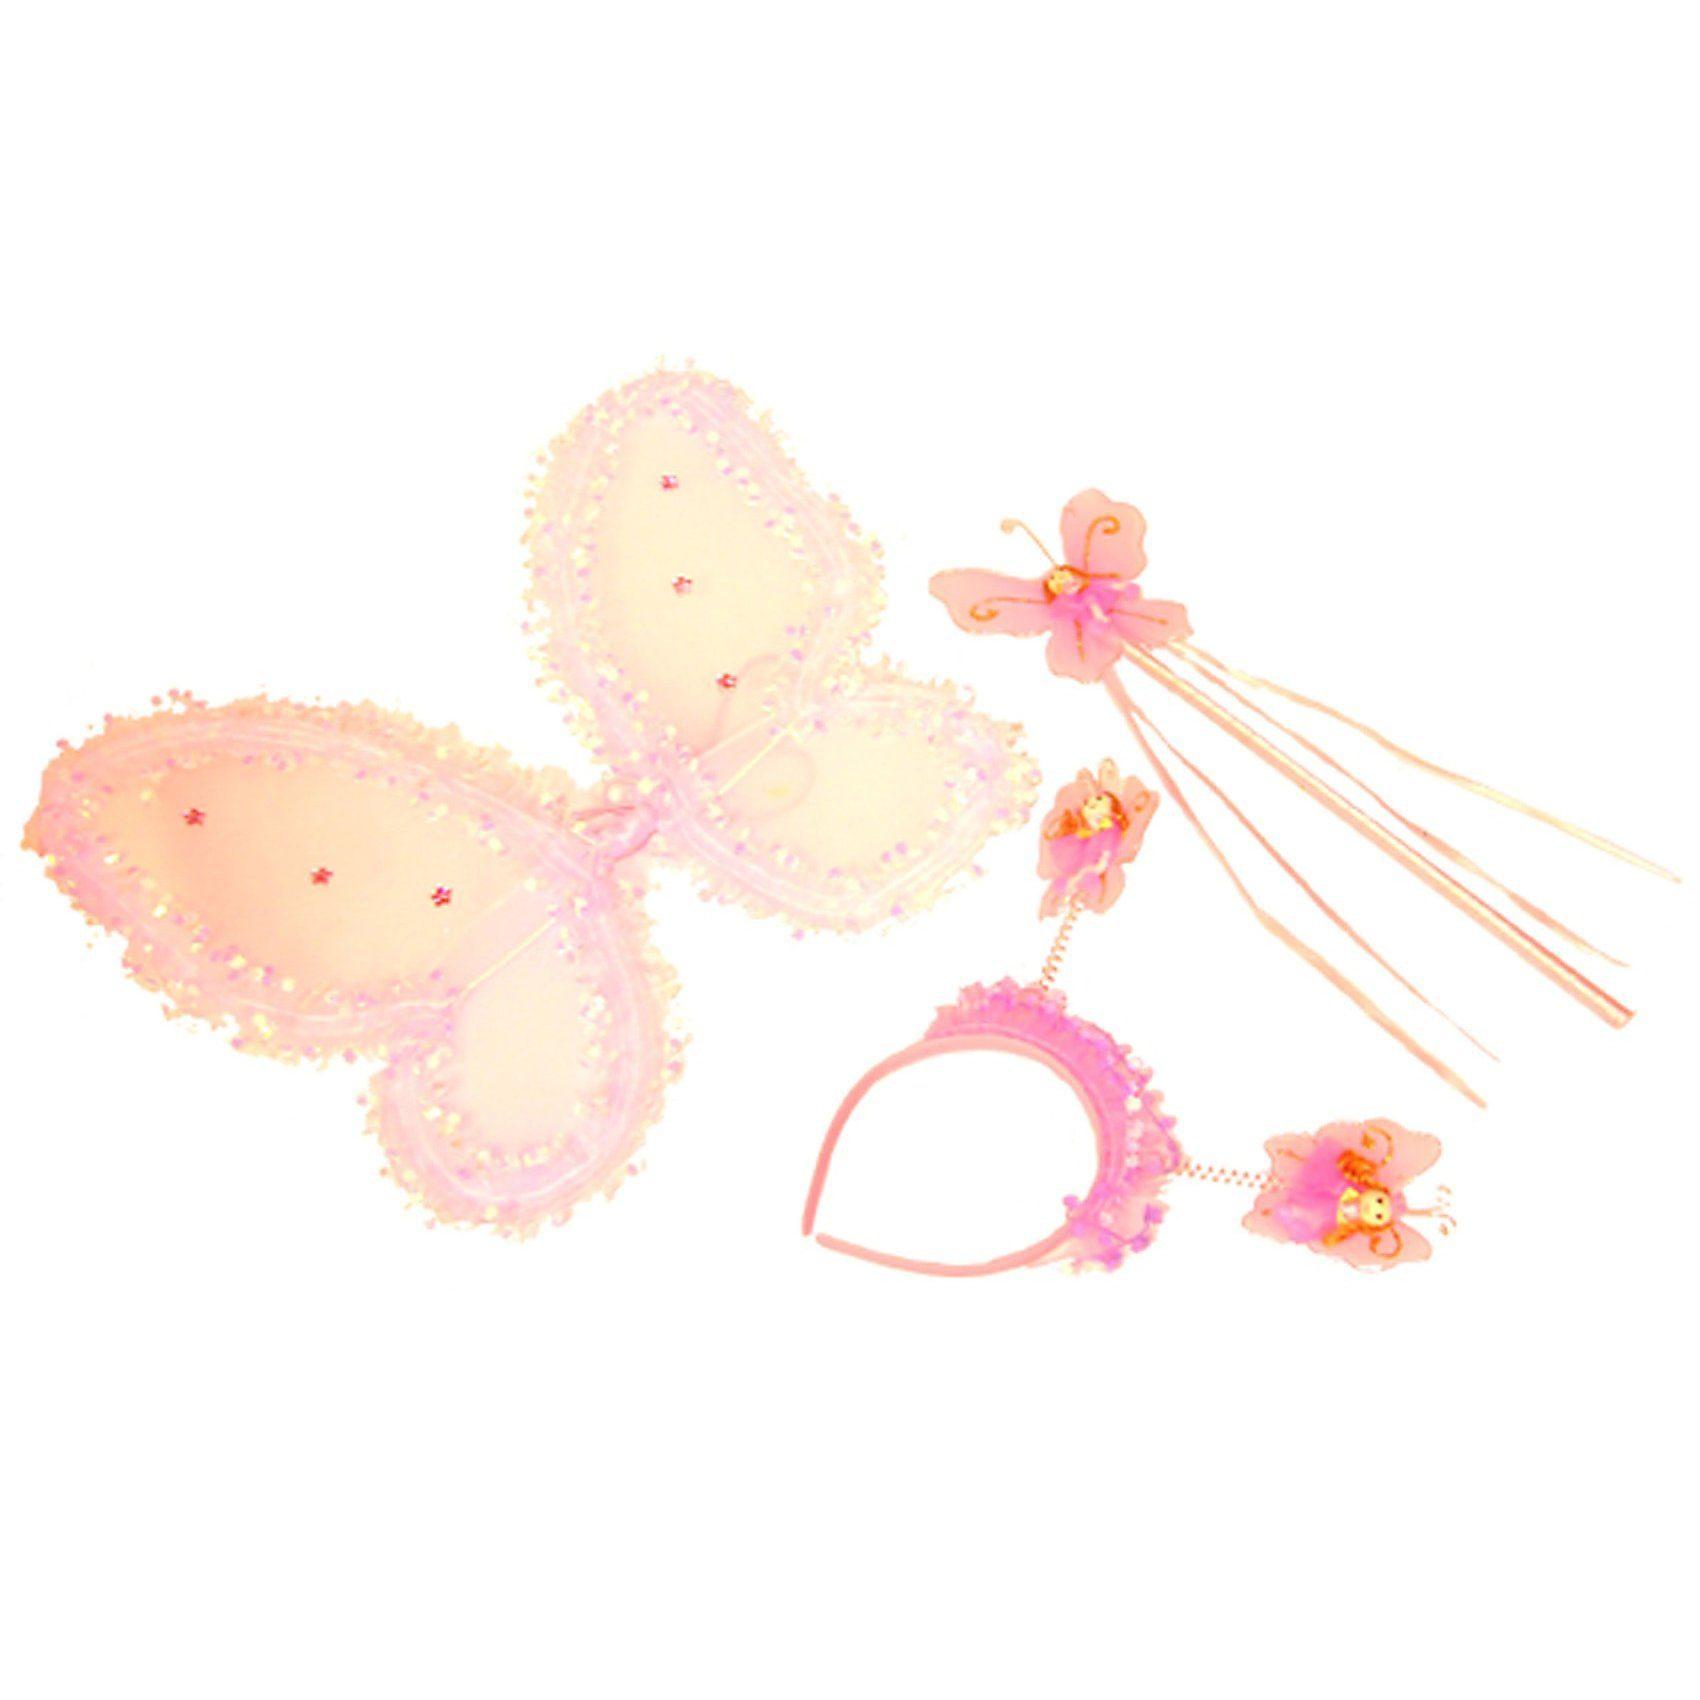 Funny Fashion Schmetterling-Set weiß pink